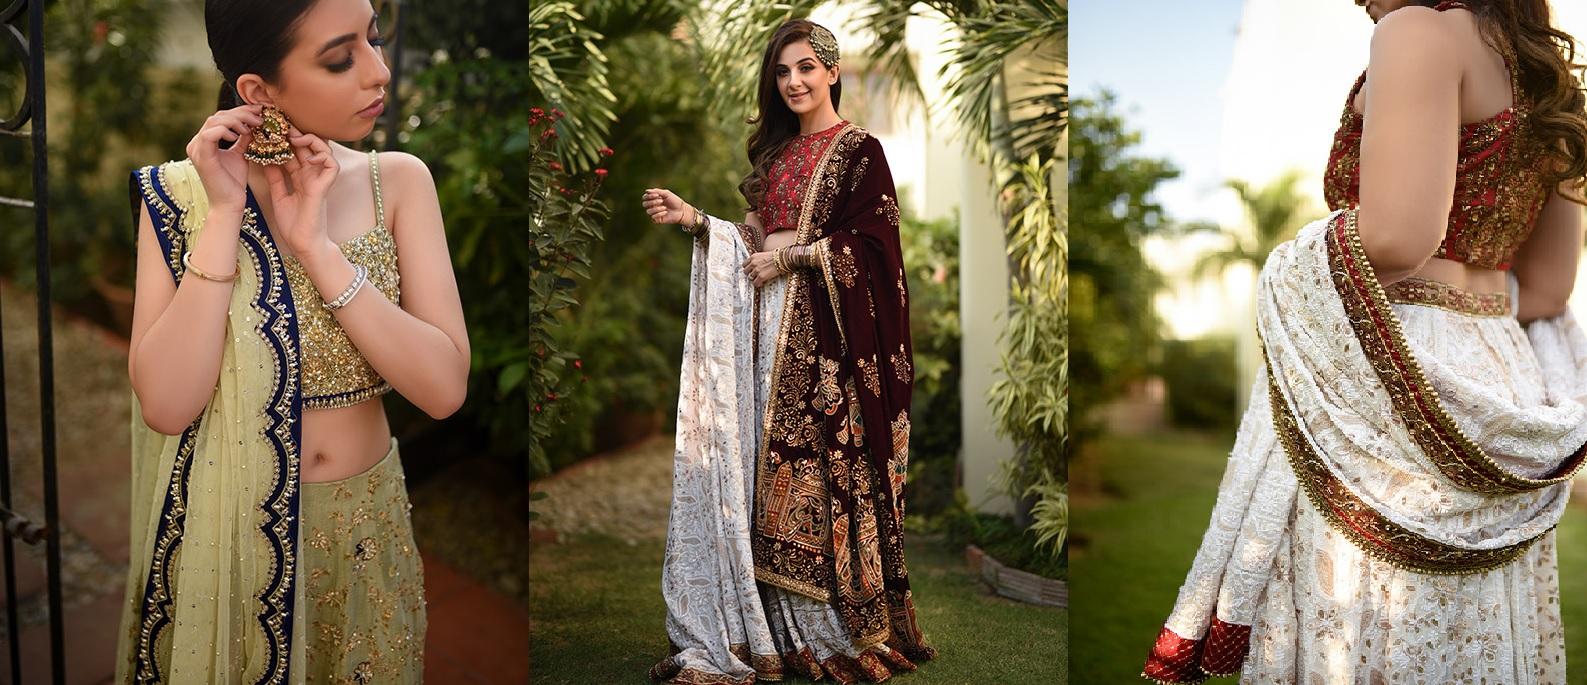 Wedding Luxury Dresses Style 2020 Decoded By Natasia Paul 22